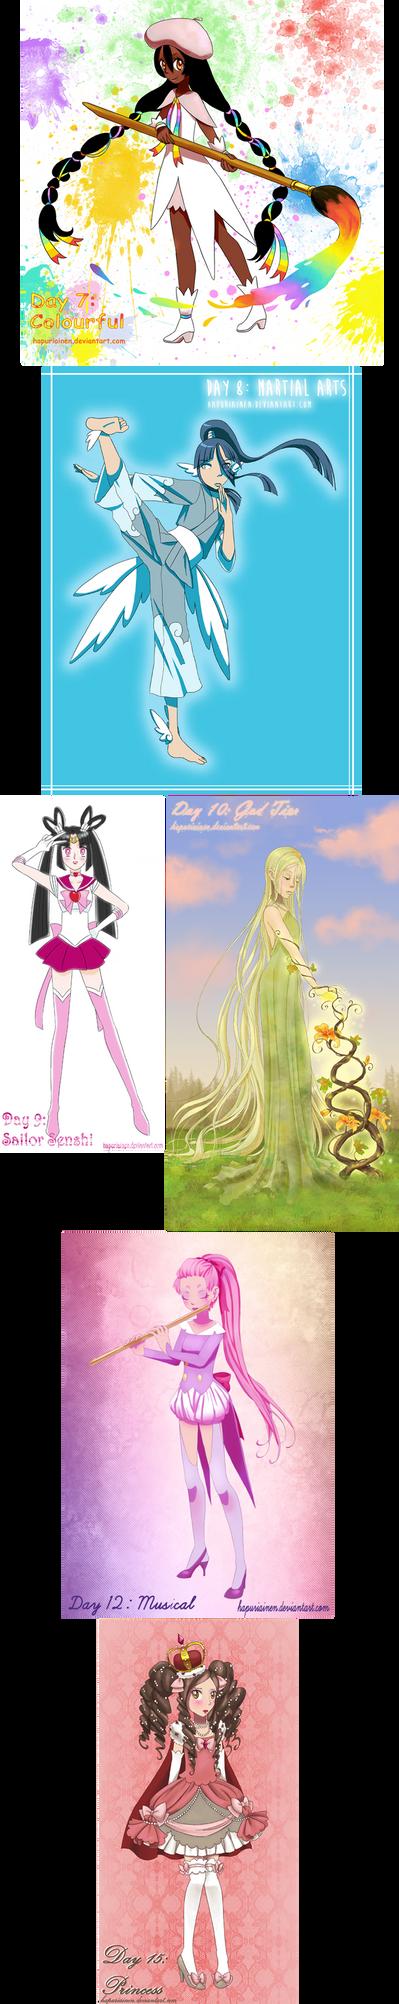 Magical Girl Challenge 2/3 by Hapuriainen